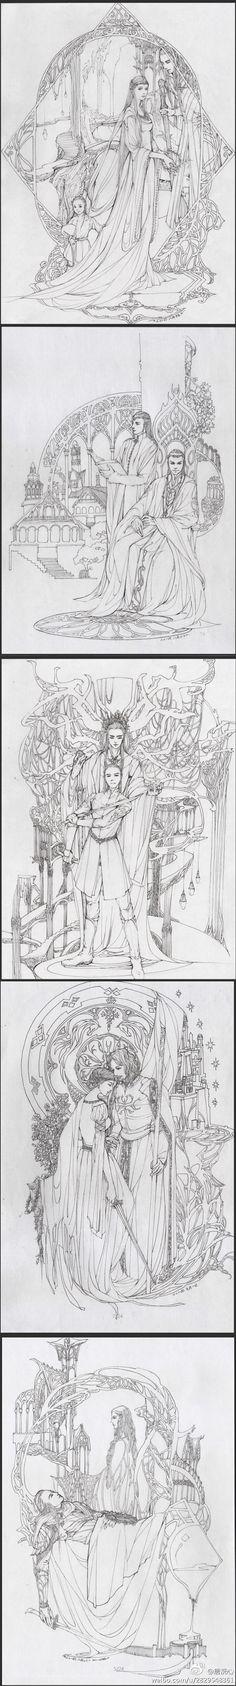 Трандуил с семье; Элронд и Линдир; Трандуил и Леголас; Эовин и Фарамир, Галадриэль